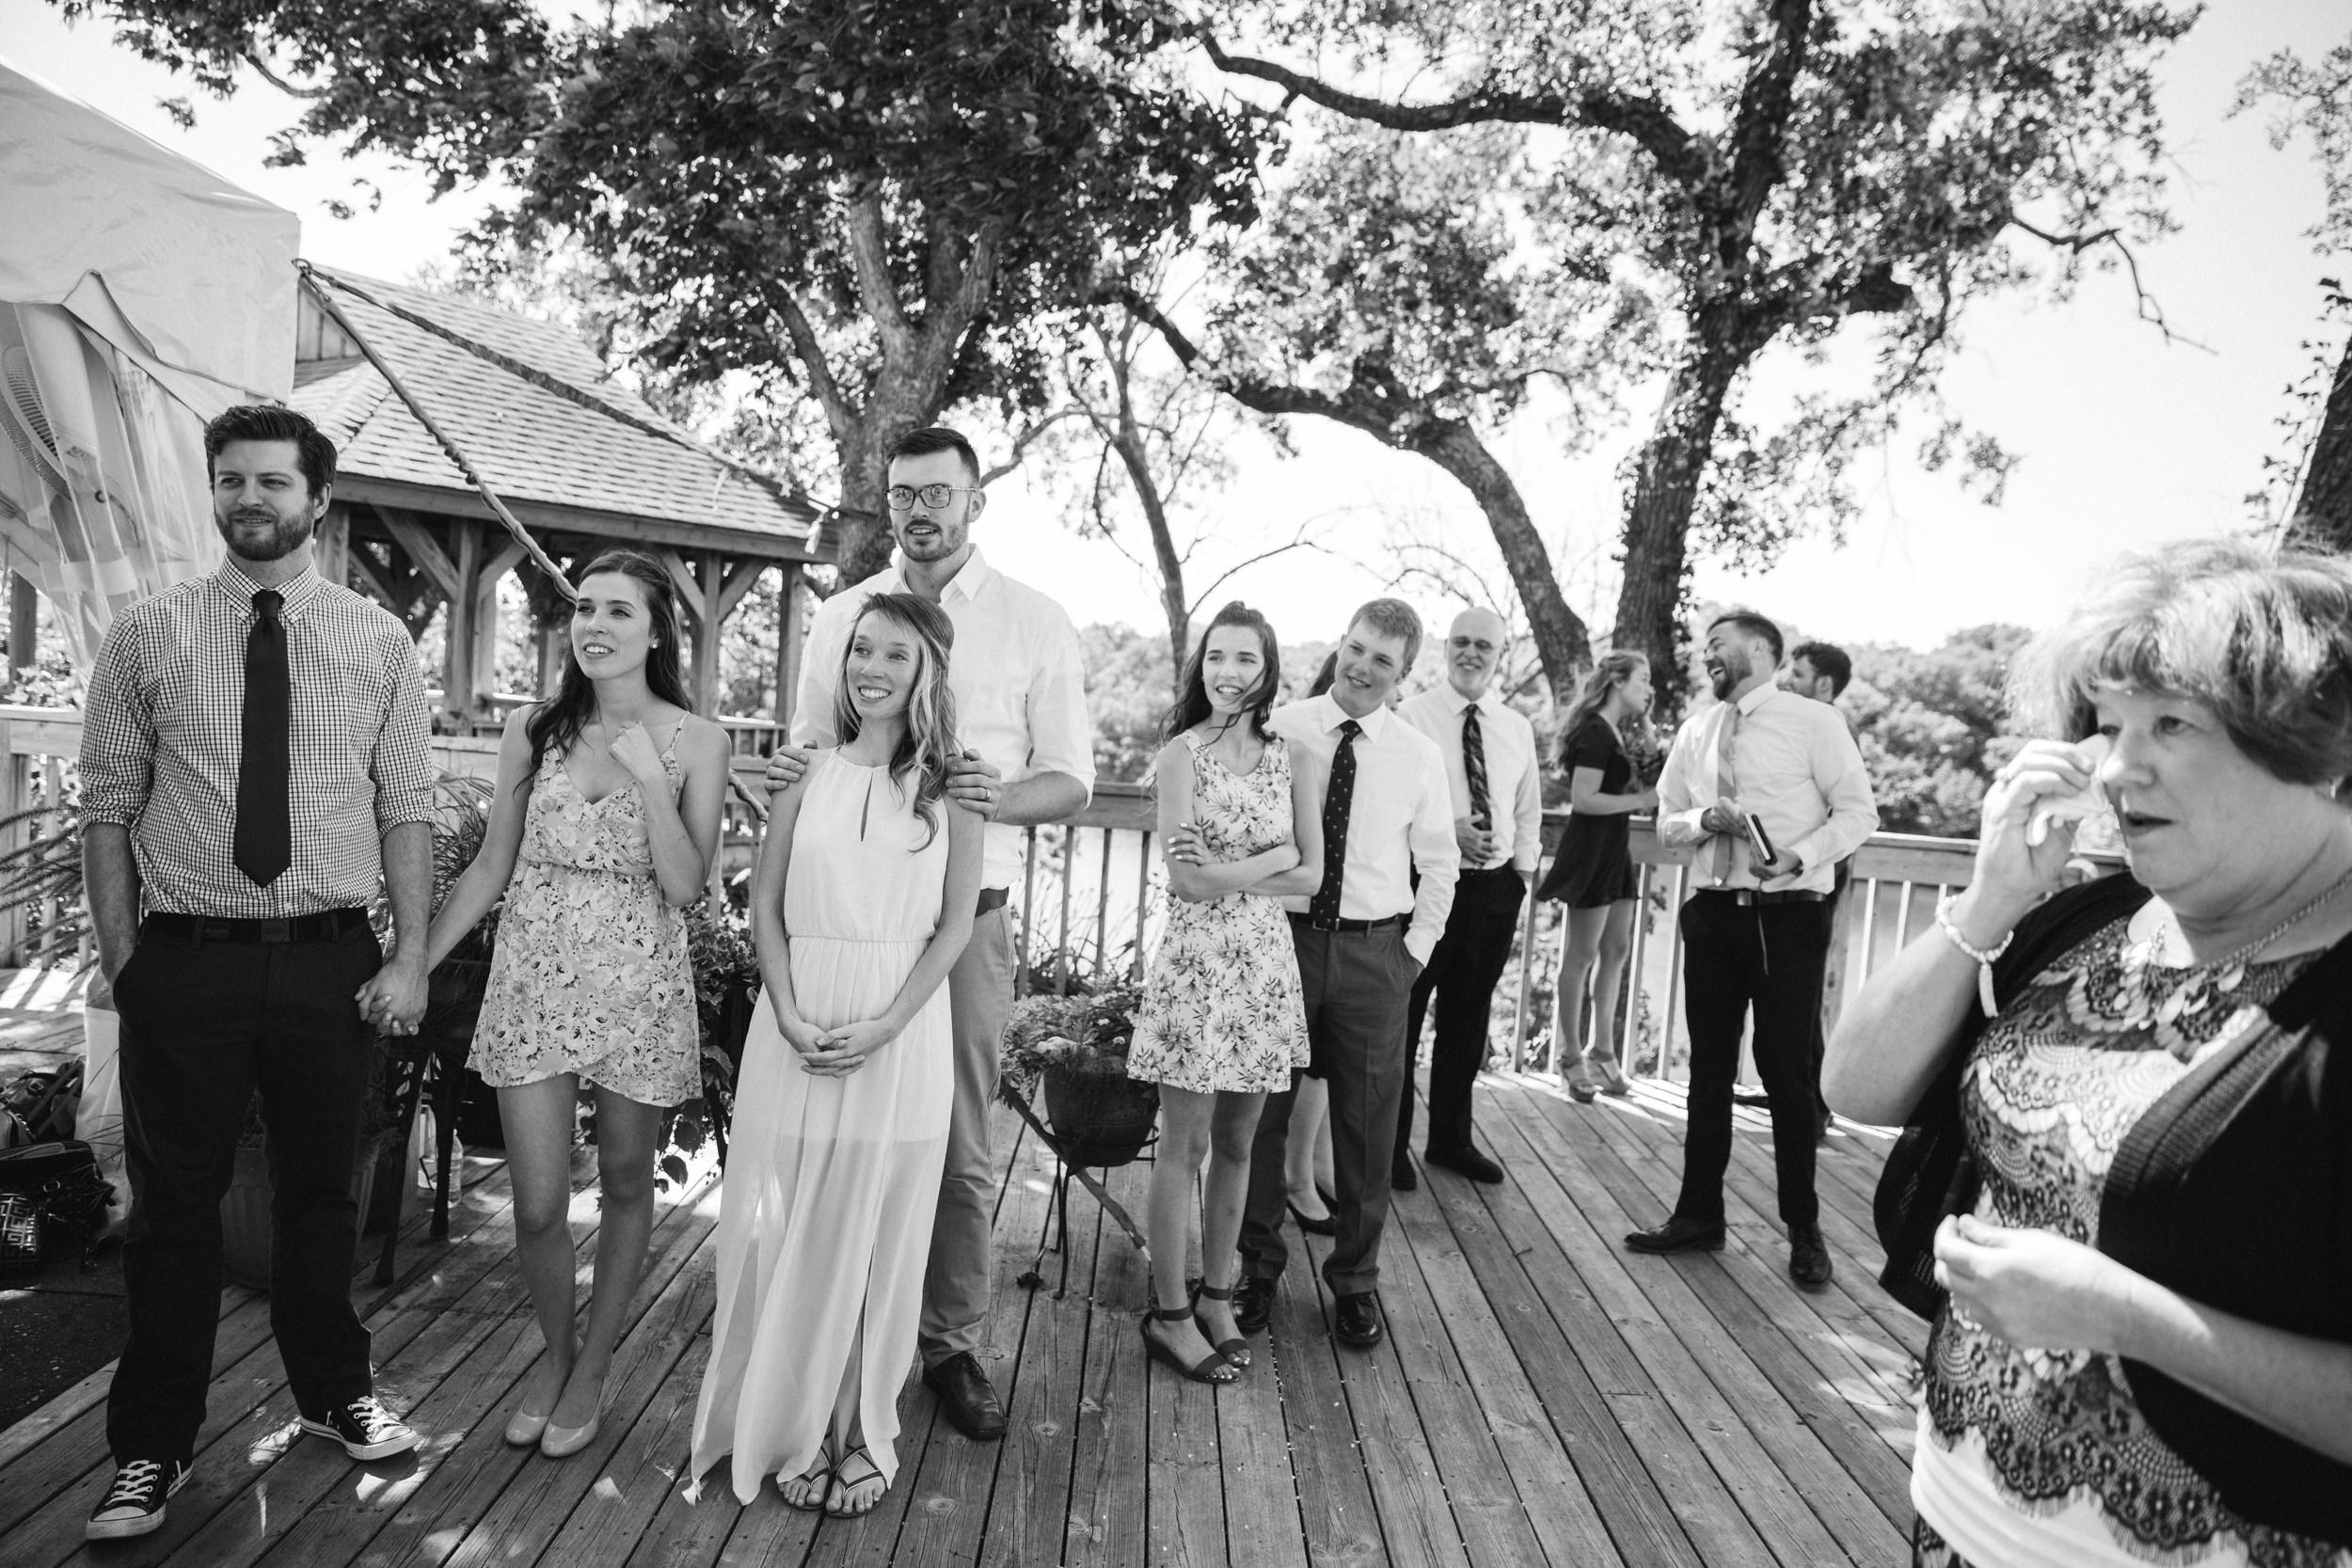 7-25-2015 Sarah and Jimmy's Eagle Ridge Downtown Galena Wedding-159.jpg